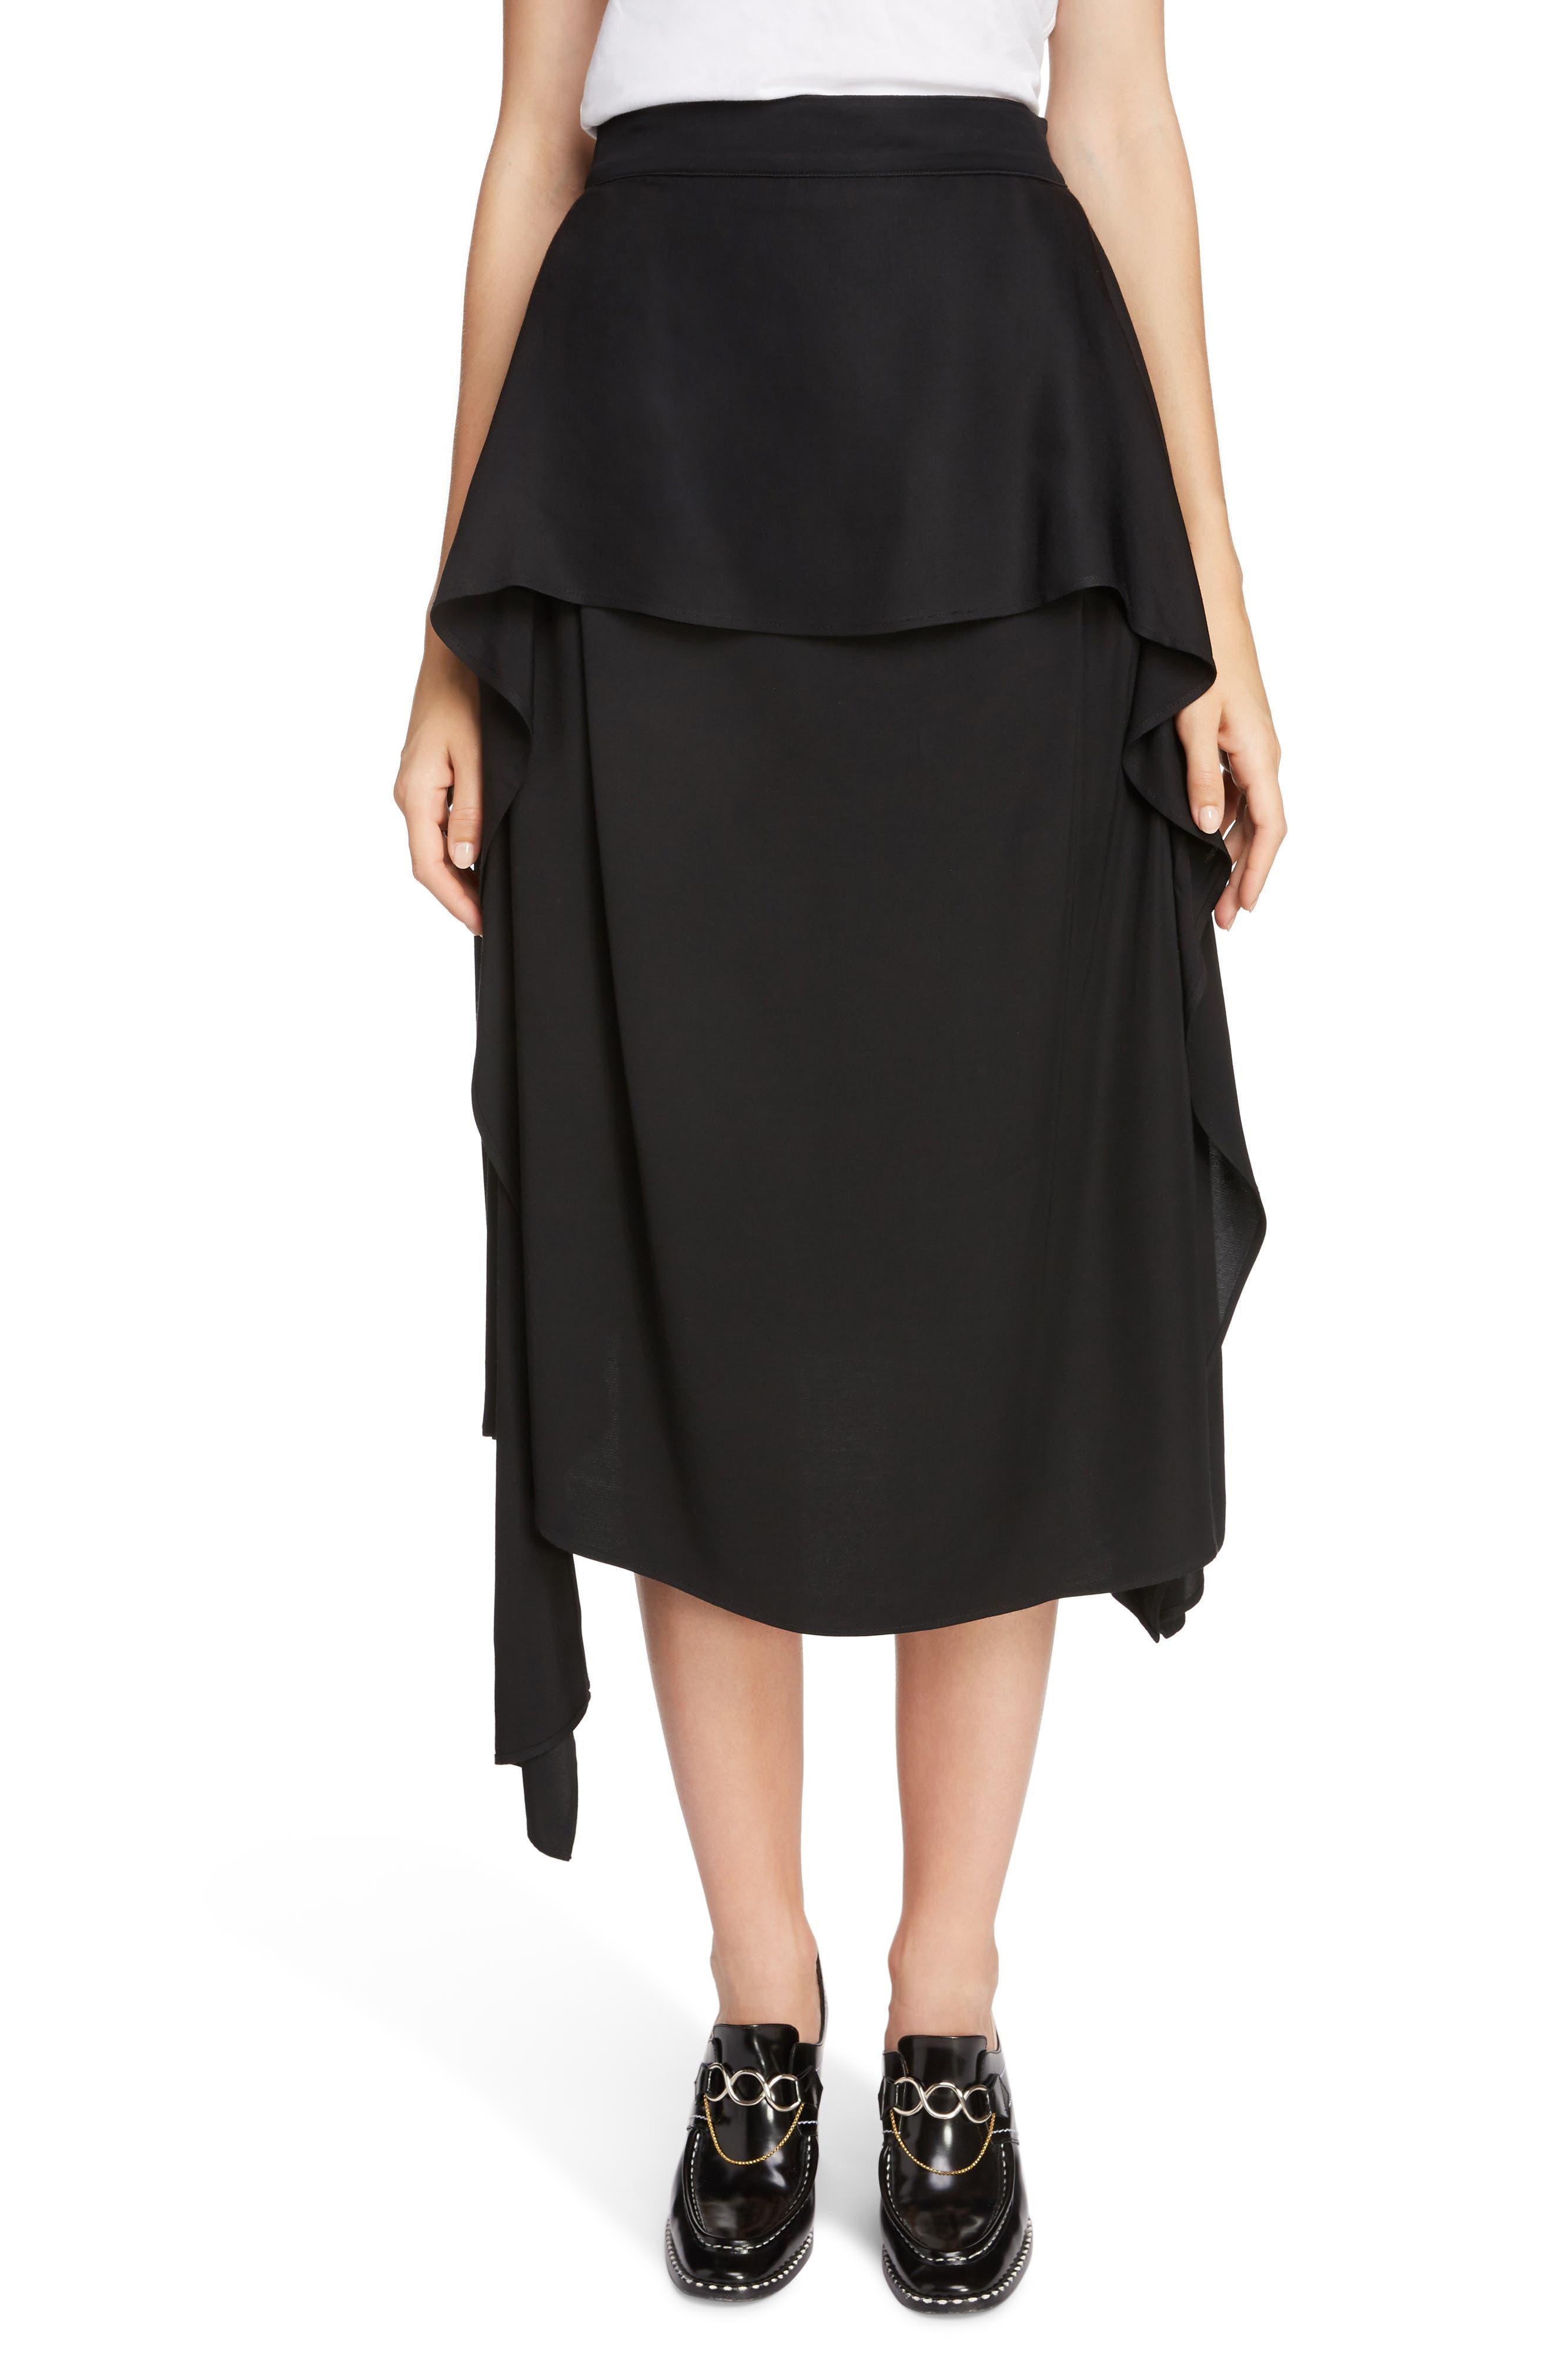 JW ANDERSON Draped Side Asymmetrical Skirt, Main, color, BLACK